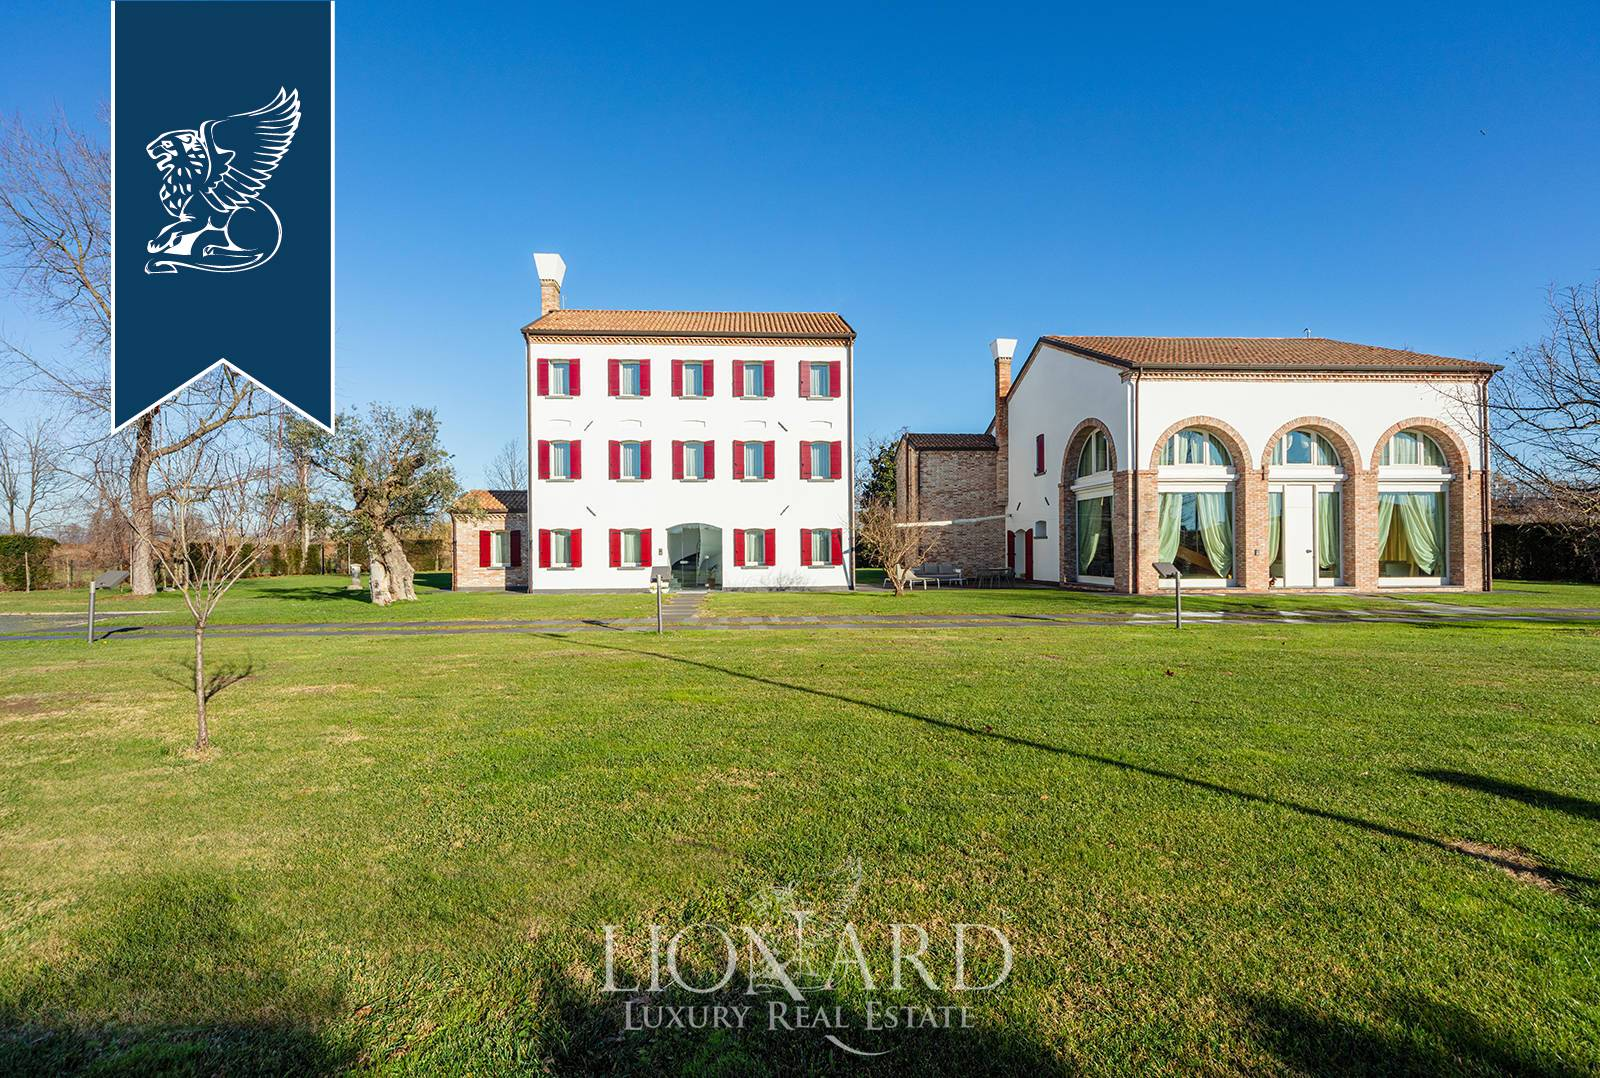 Rustico in Vendita a San Dona' Di Piave: 0 locali, 1000 mq - Foto 1